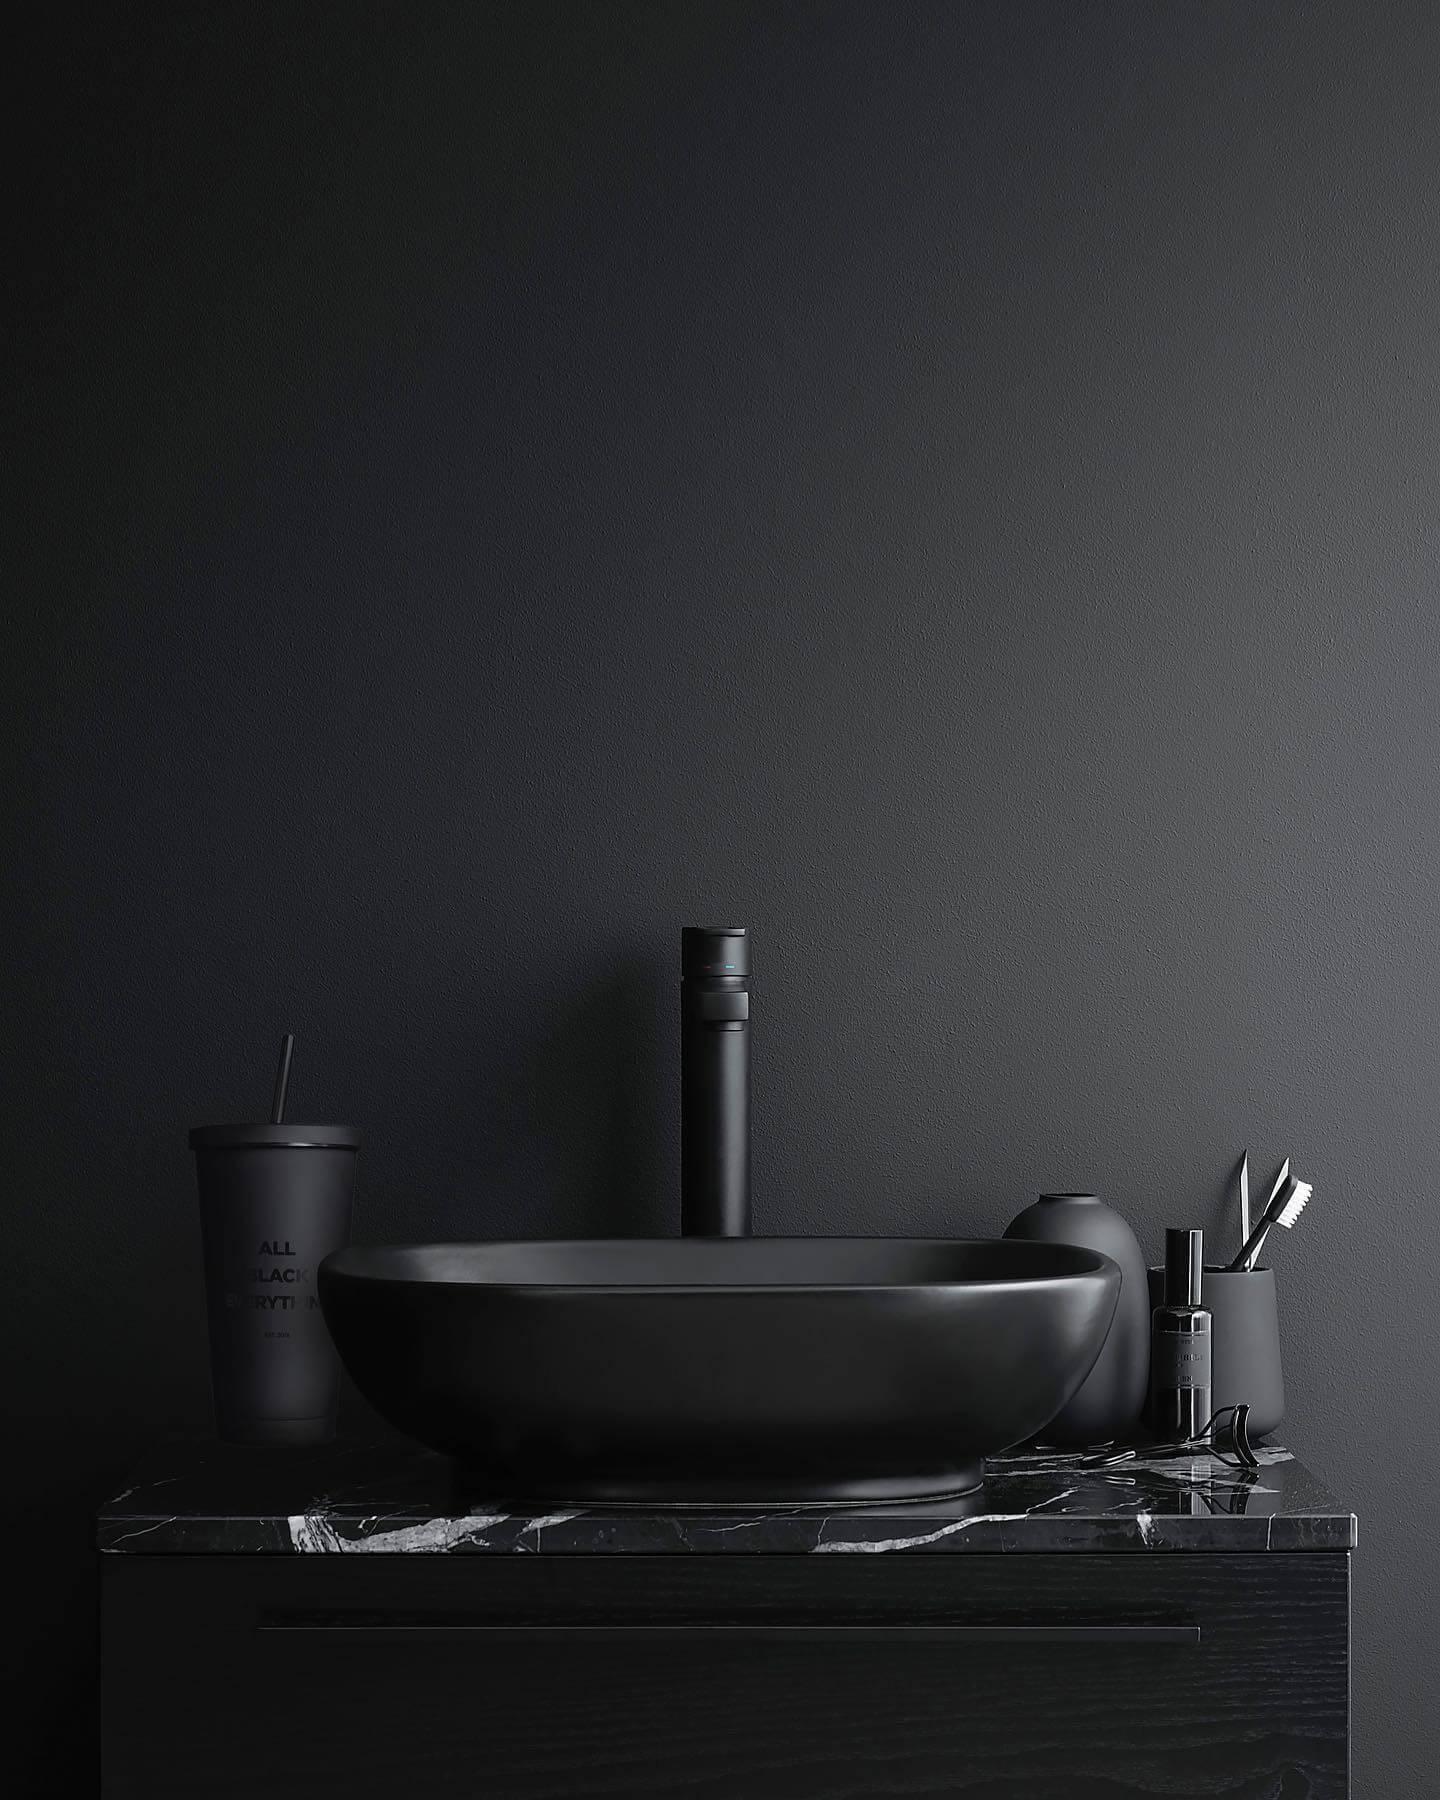 BLACK 纯色之美-BlueDotCC, 蓝点文化创意